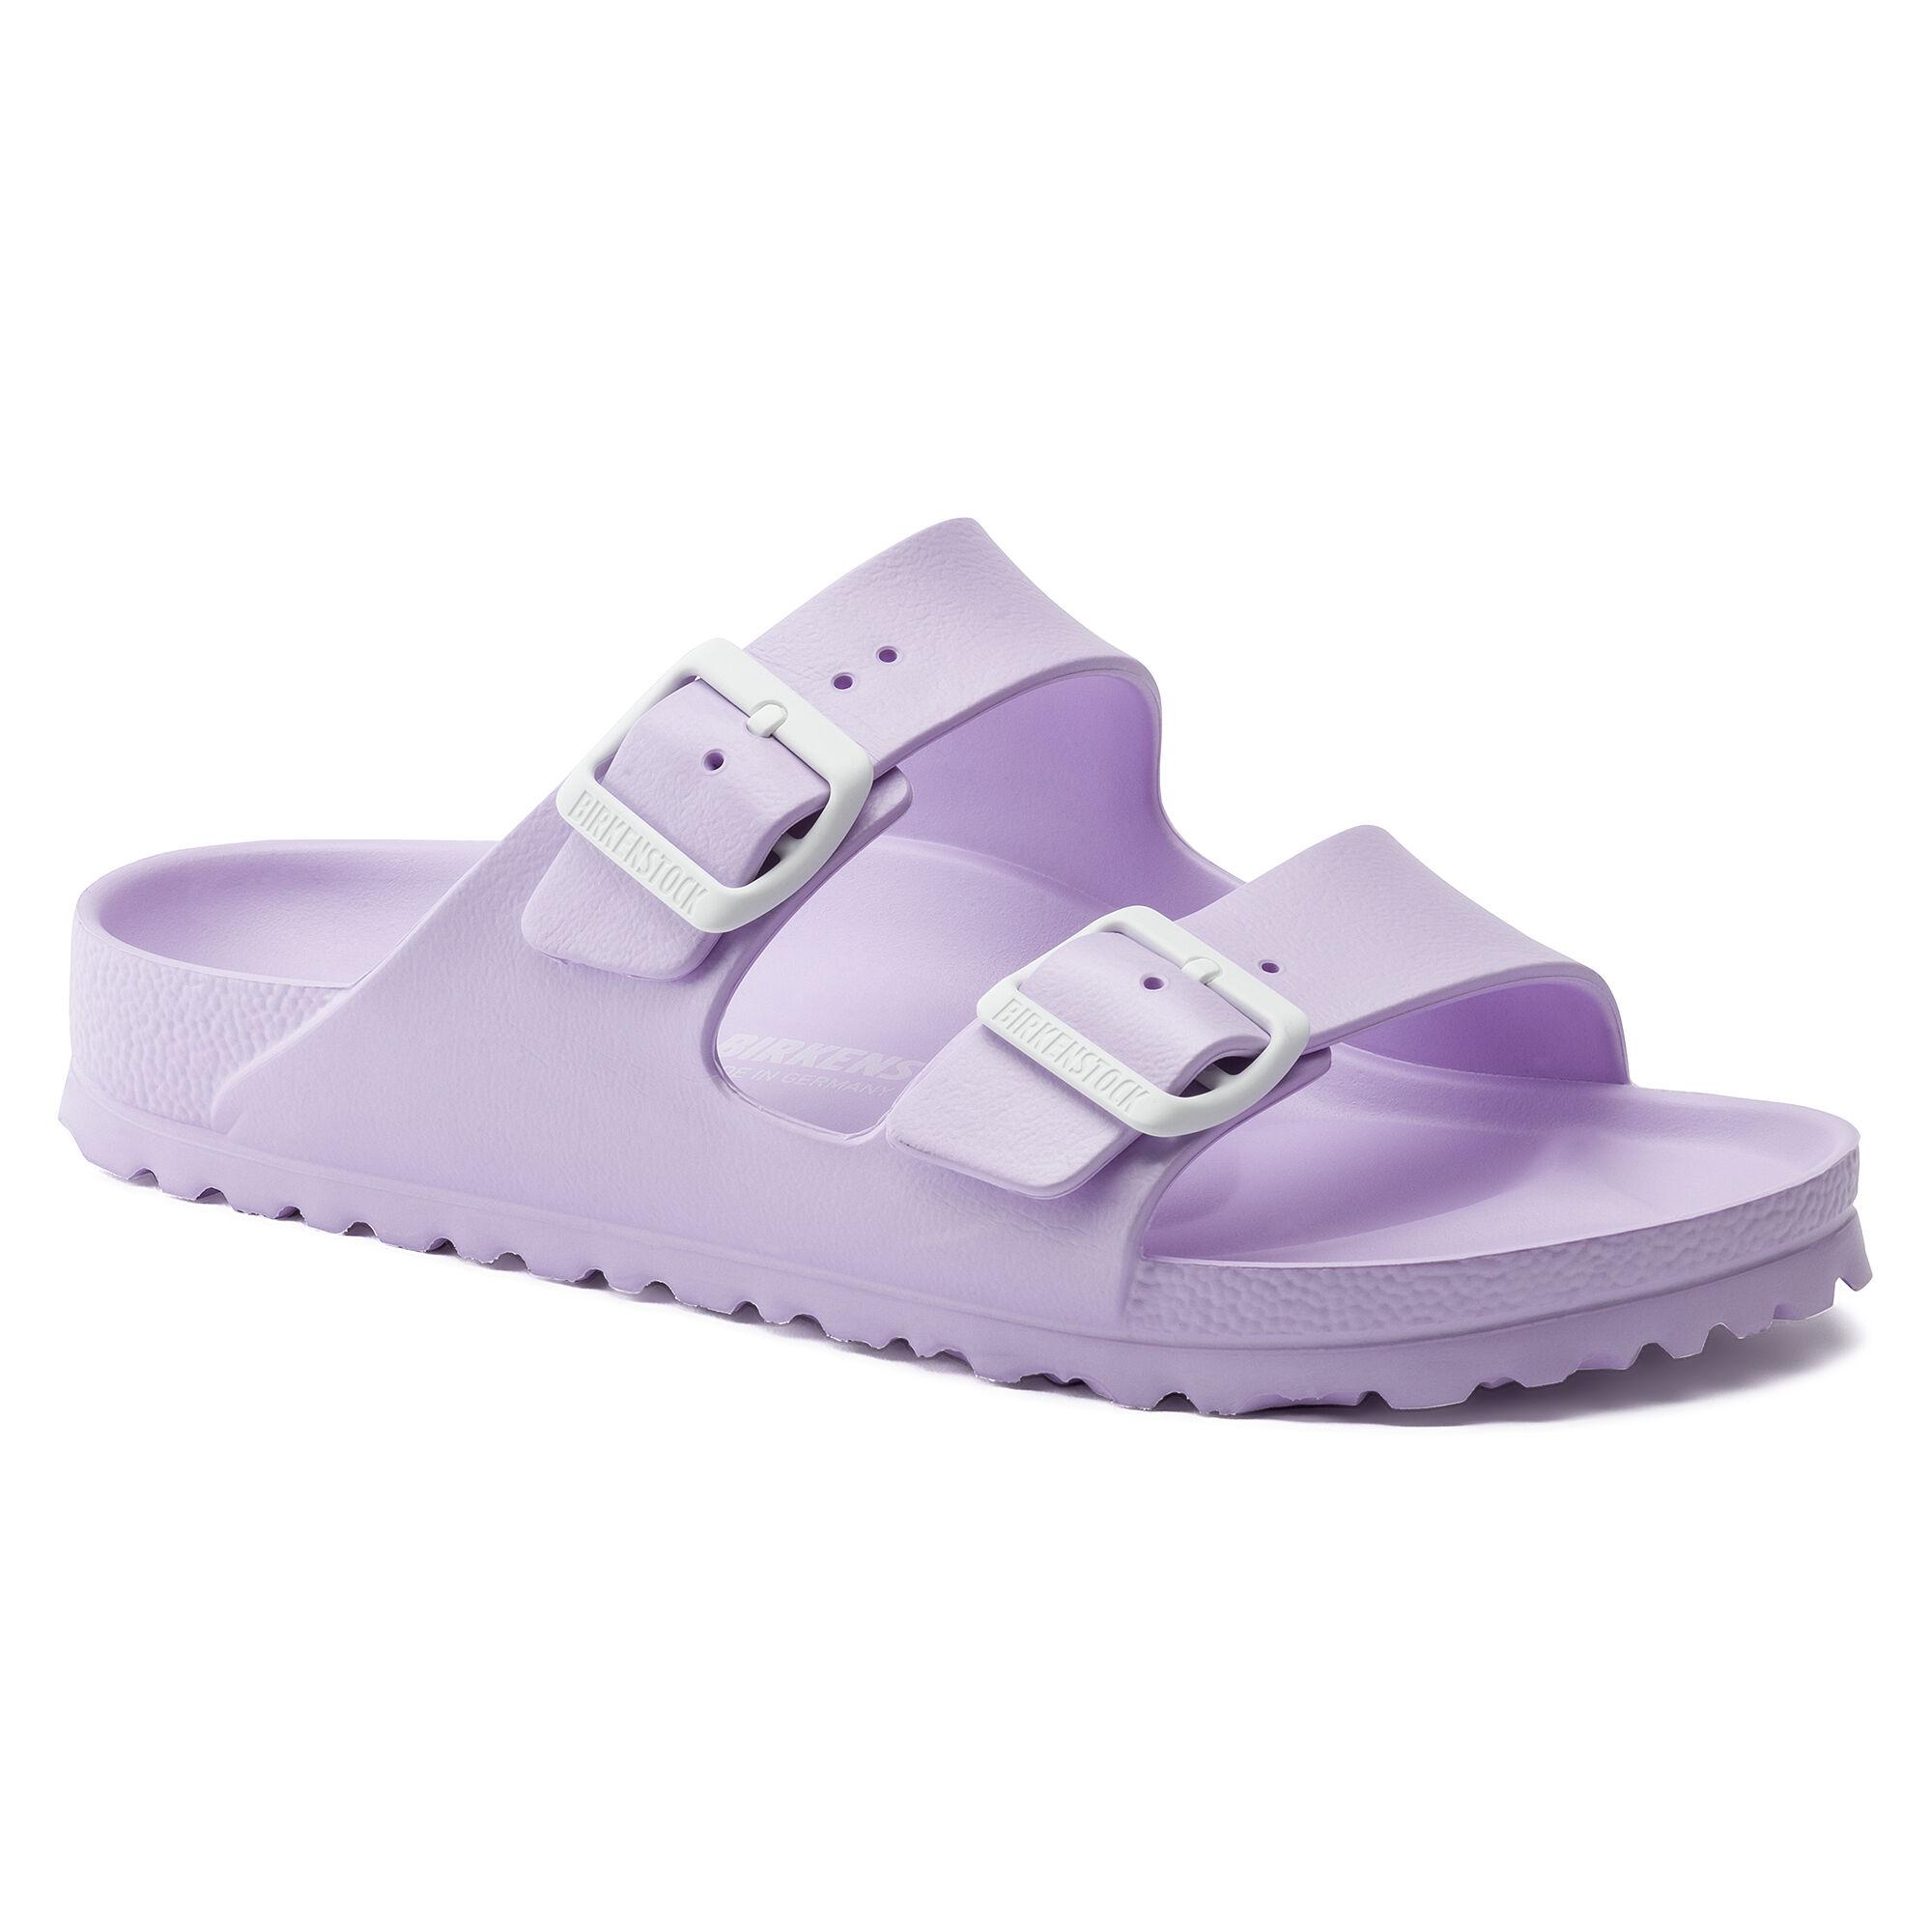 Arizona EVA Soft Lilac | shop online at